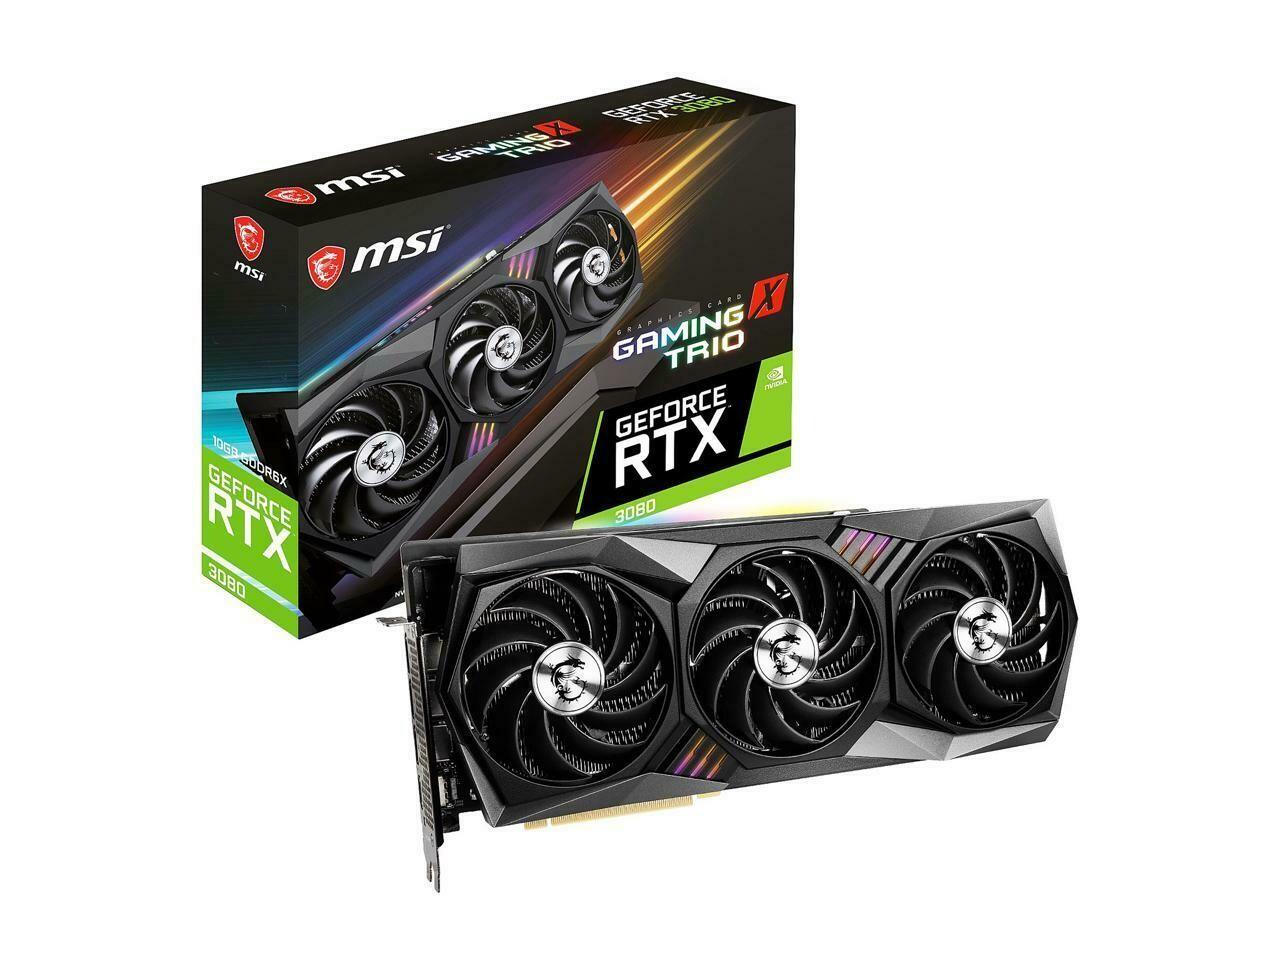 MSI GeForce RTX 3080 GAMING TRIO X 10G 10GB 320-Bit GDDR6X Video Card